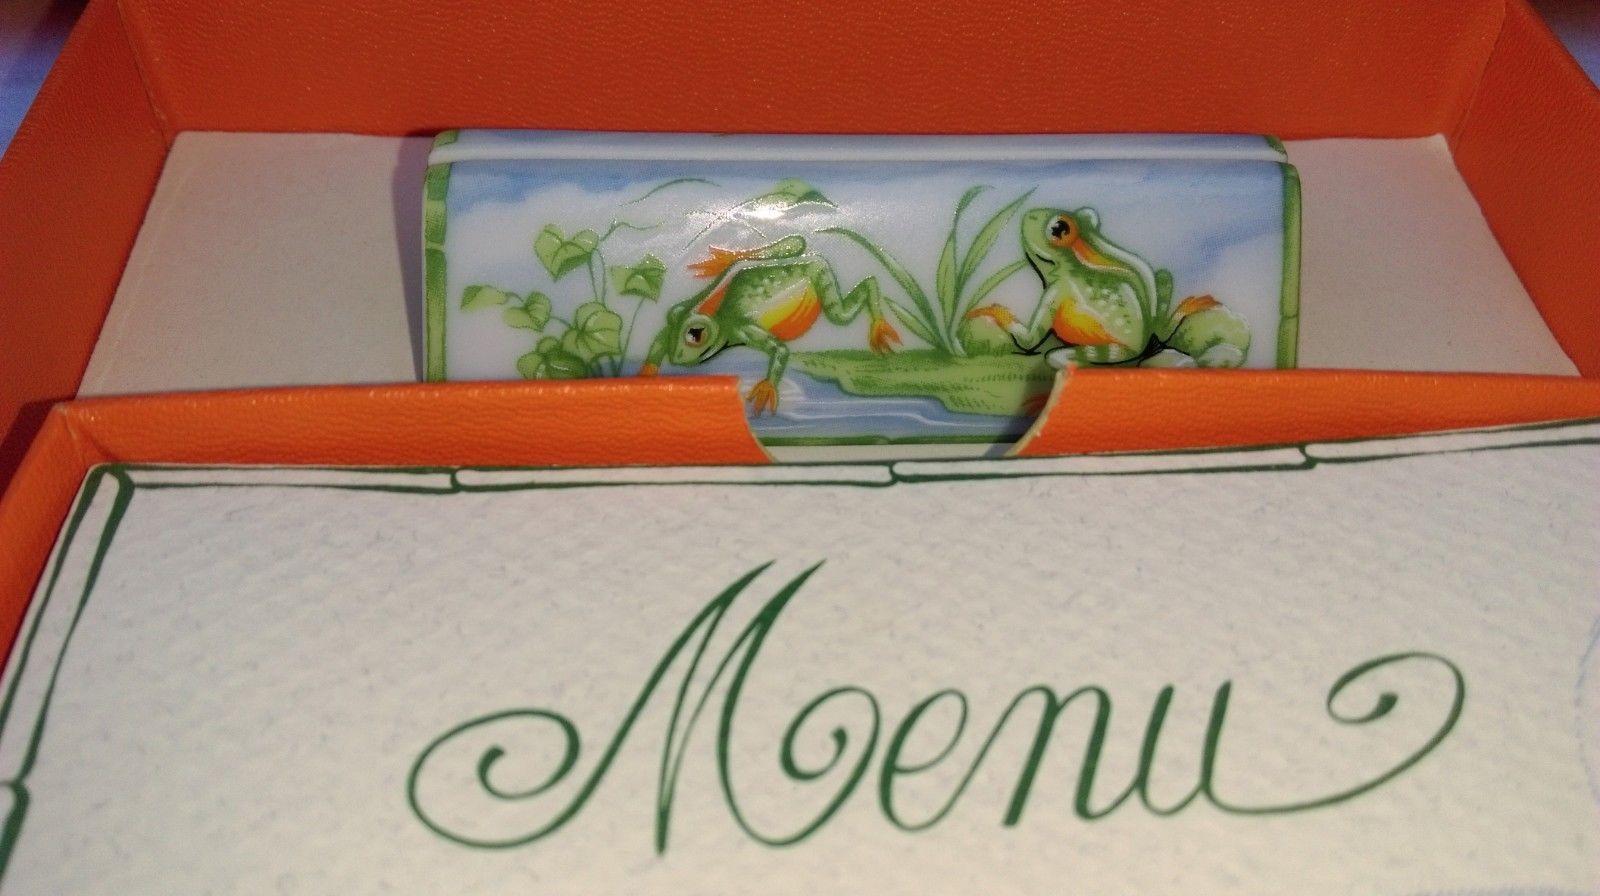 Paire de porte-menus HERMÈS pour MASS MEDIA neuf jamais servi boîte  d origine 665f4d59d3f